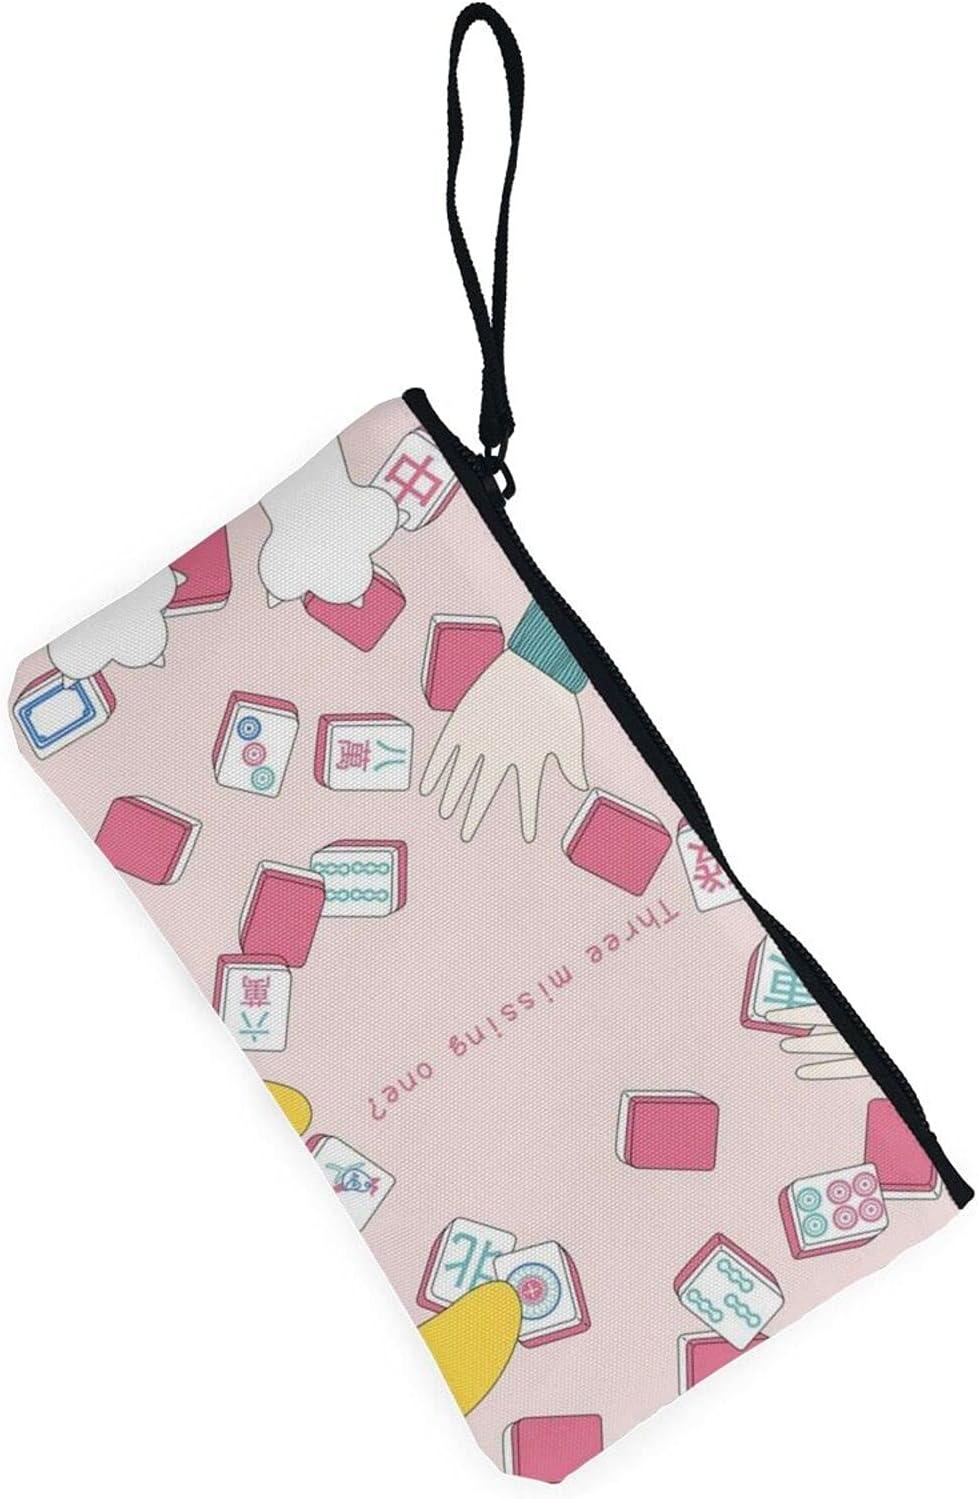 AORRUAM Mahjong human hand cat Canvas Coin Purse,Canvas Zipper Pencil Cases,Canvas Change Purse Pouch Mini Wallet Coin Bag